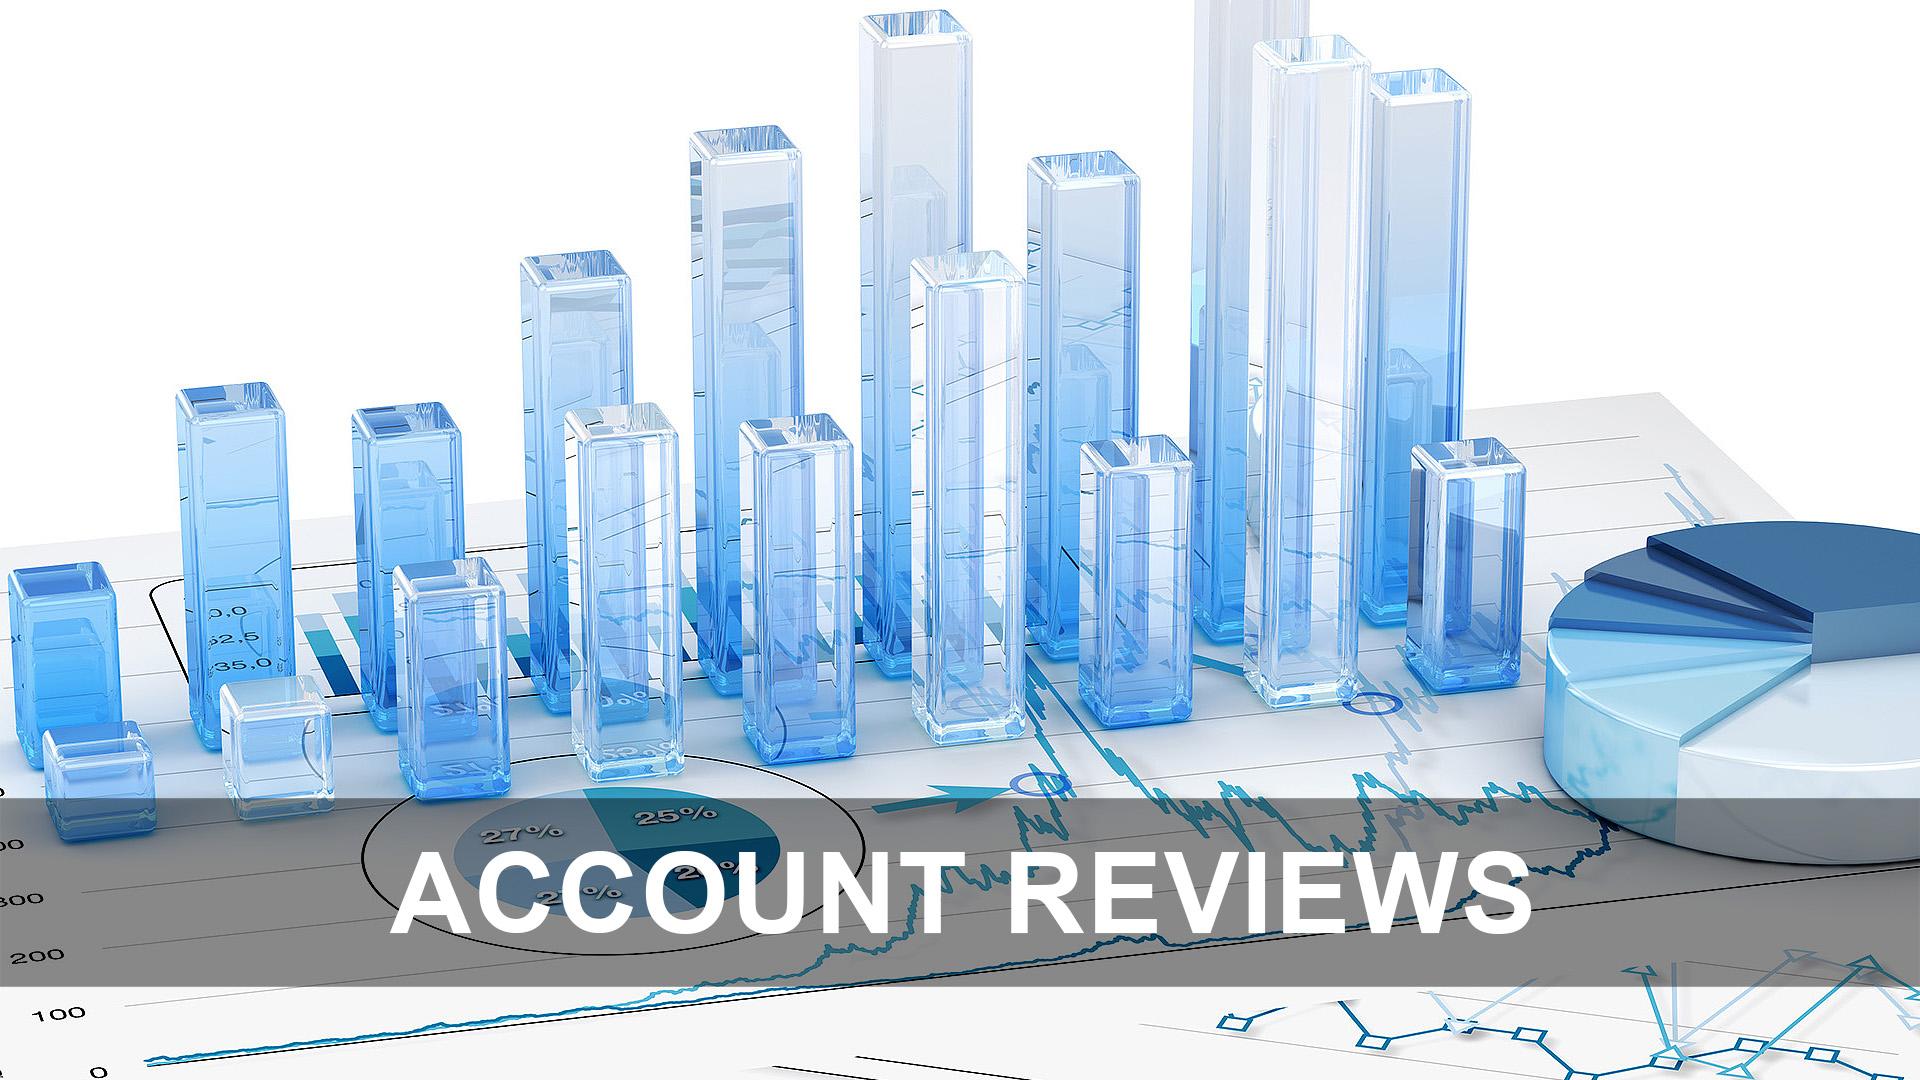 Account Reviews - KAM.jpg